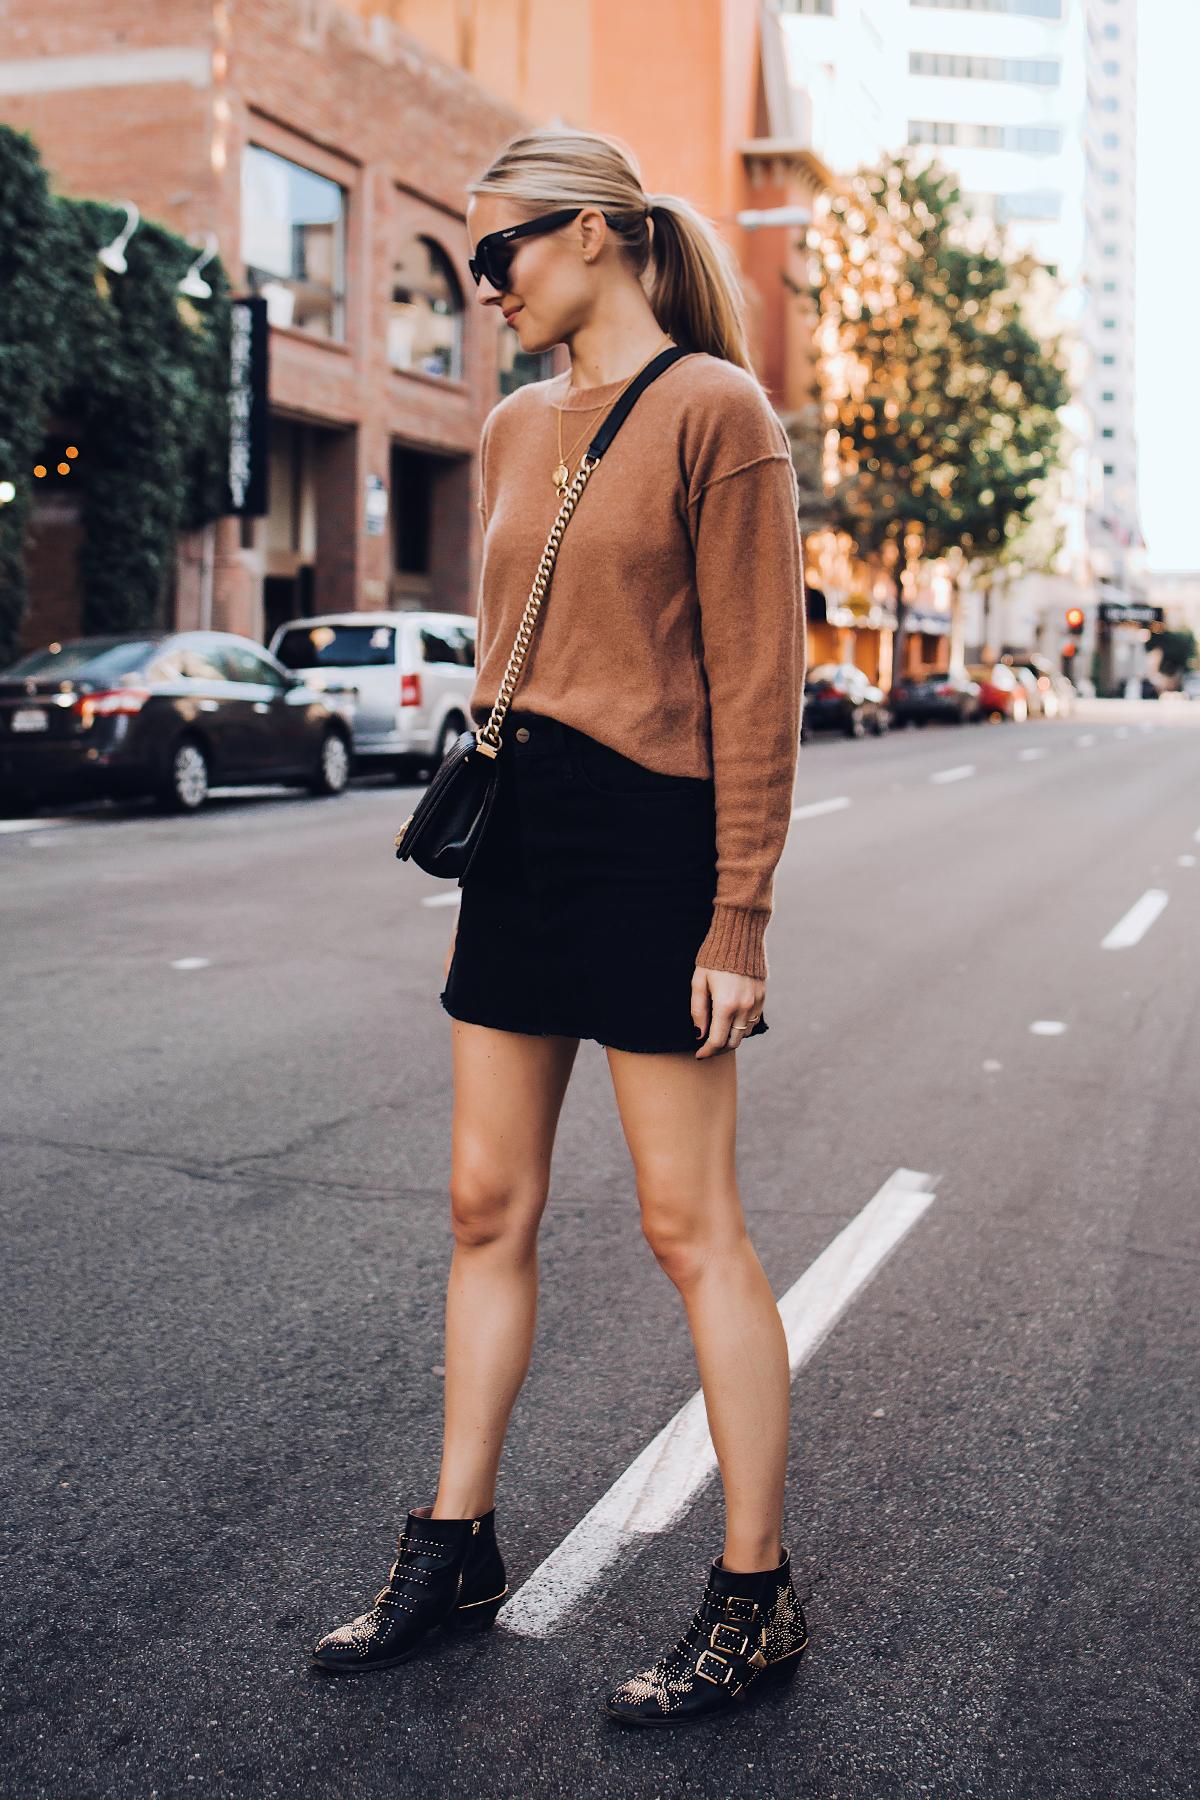 Blonde Woman Wearing Free People Tan Sweater Black Denim Skirt Chloe Susanna Blacks Booties Outfit Fashion Jackson San Diego Fashion Blogger Street Style